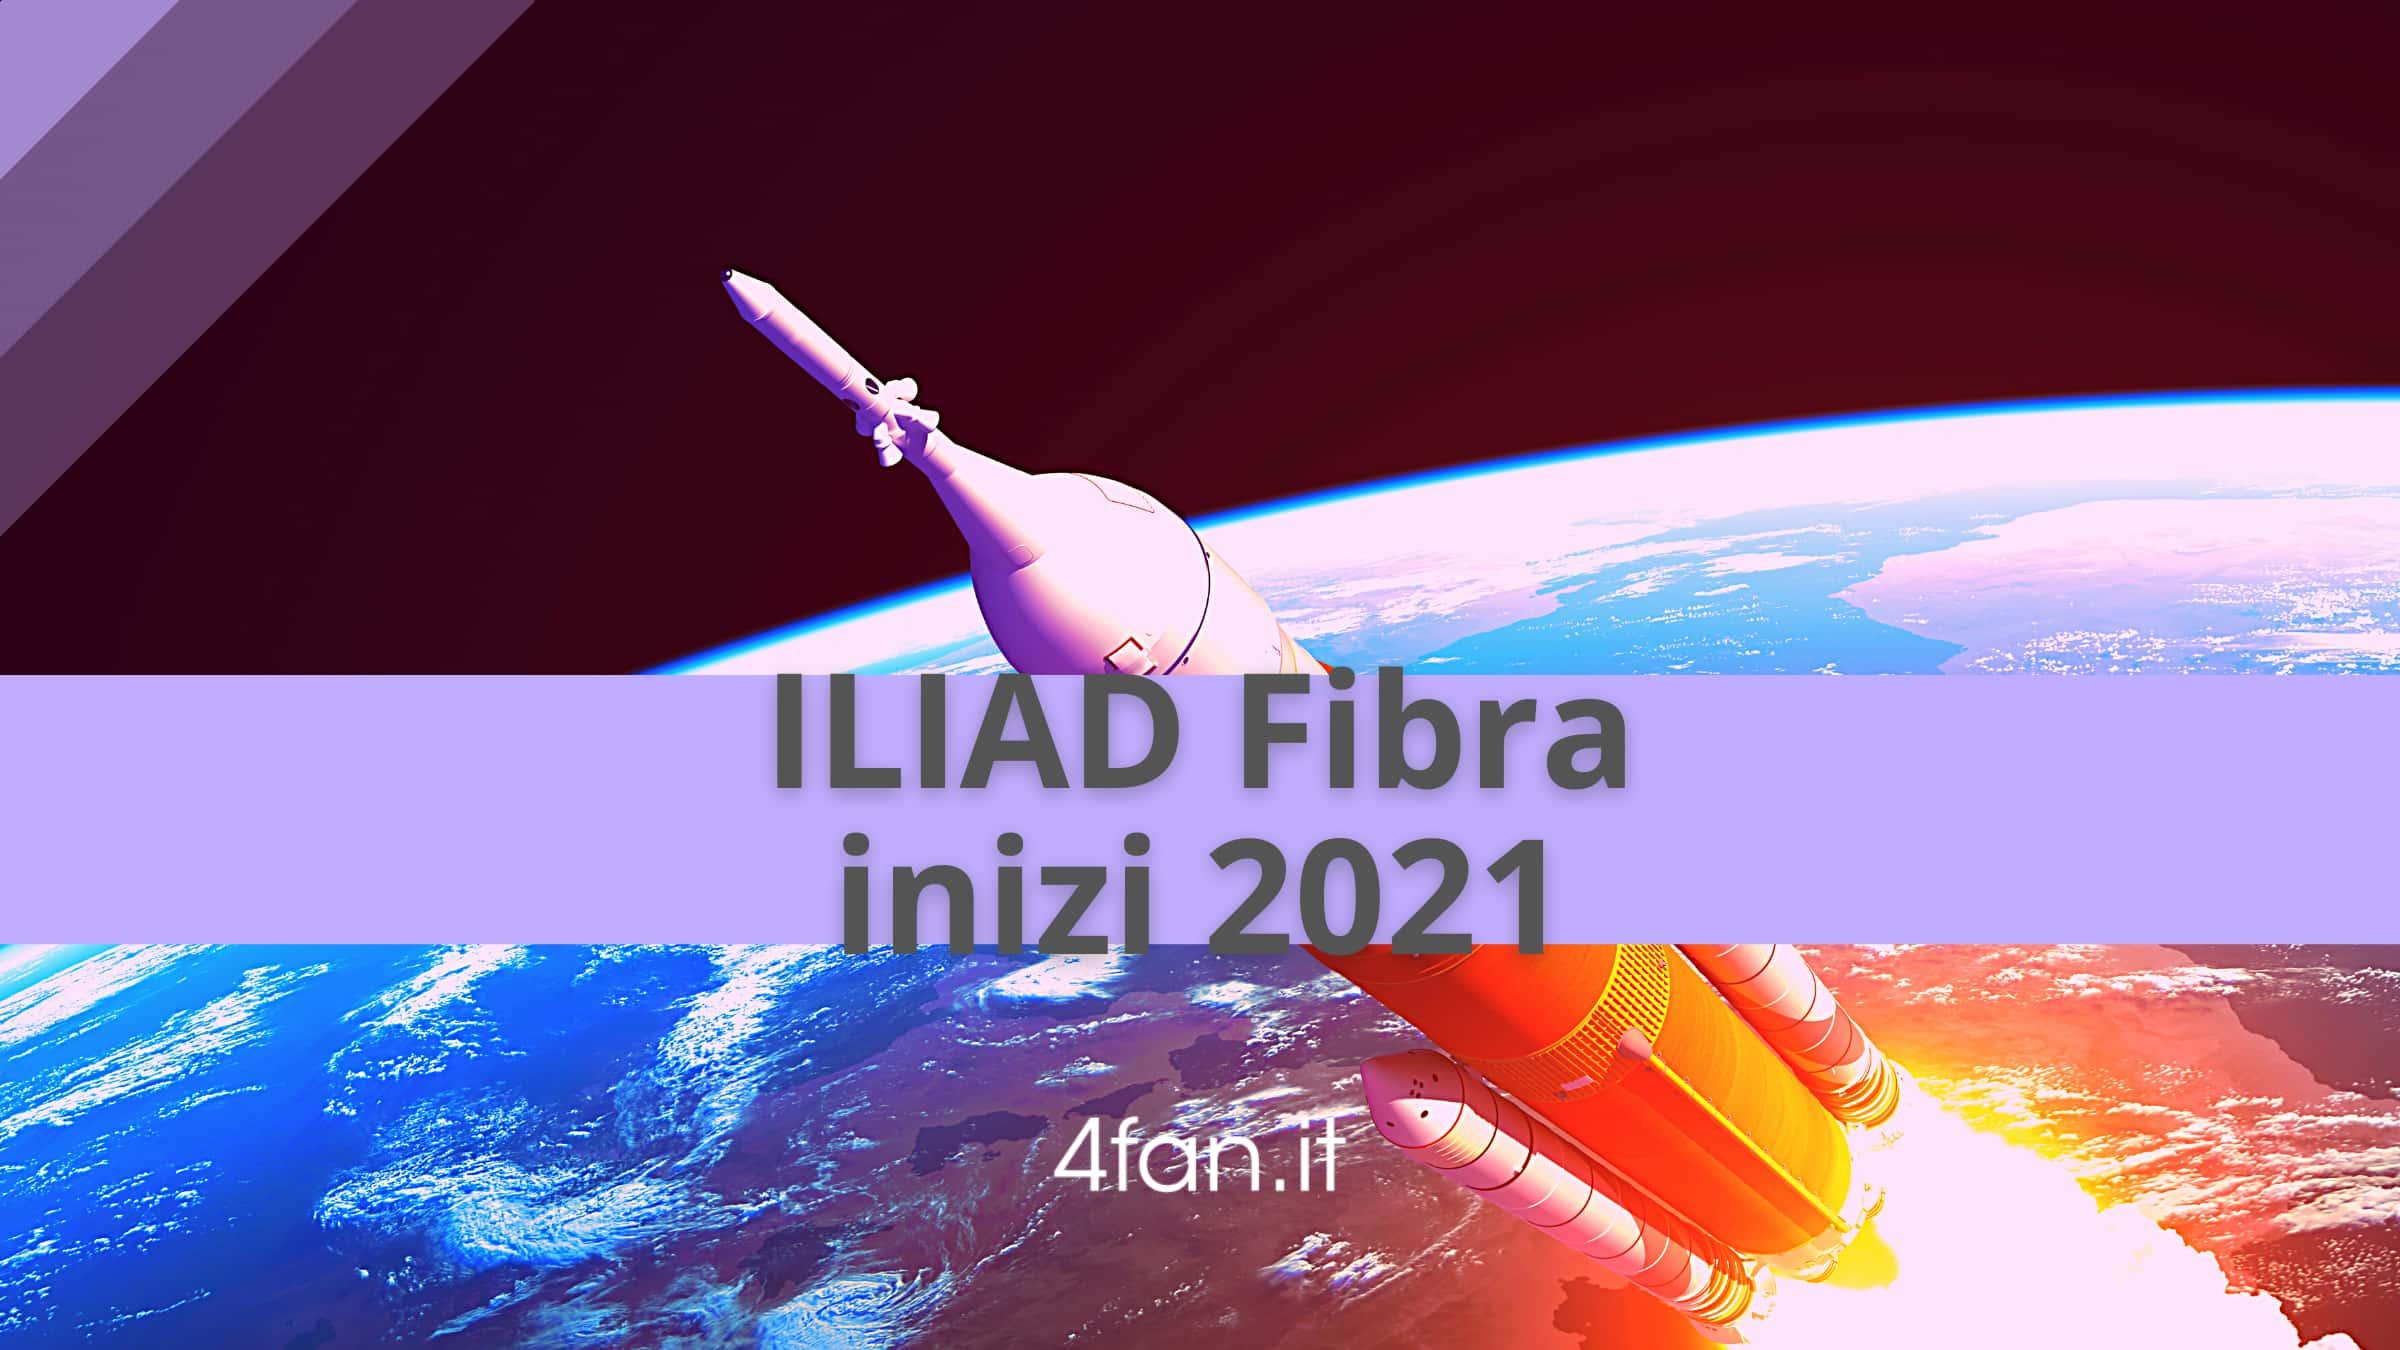 Iliad Fibra 2021